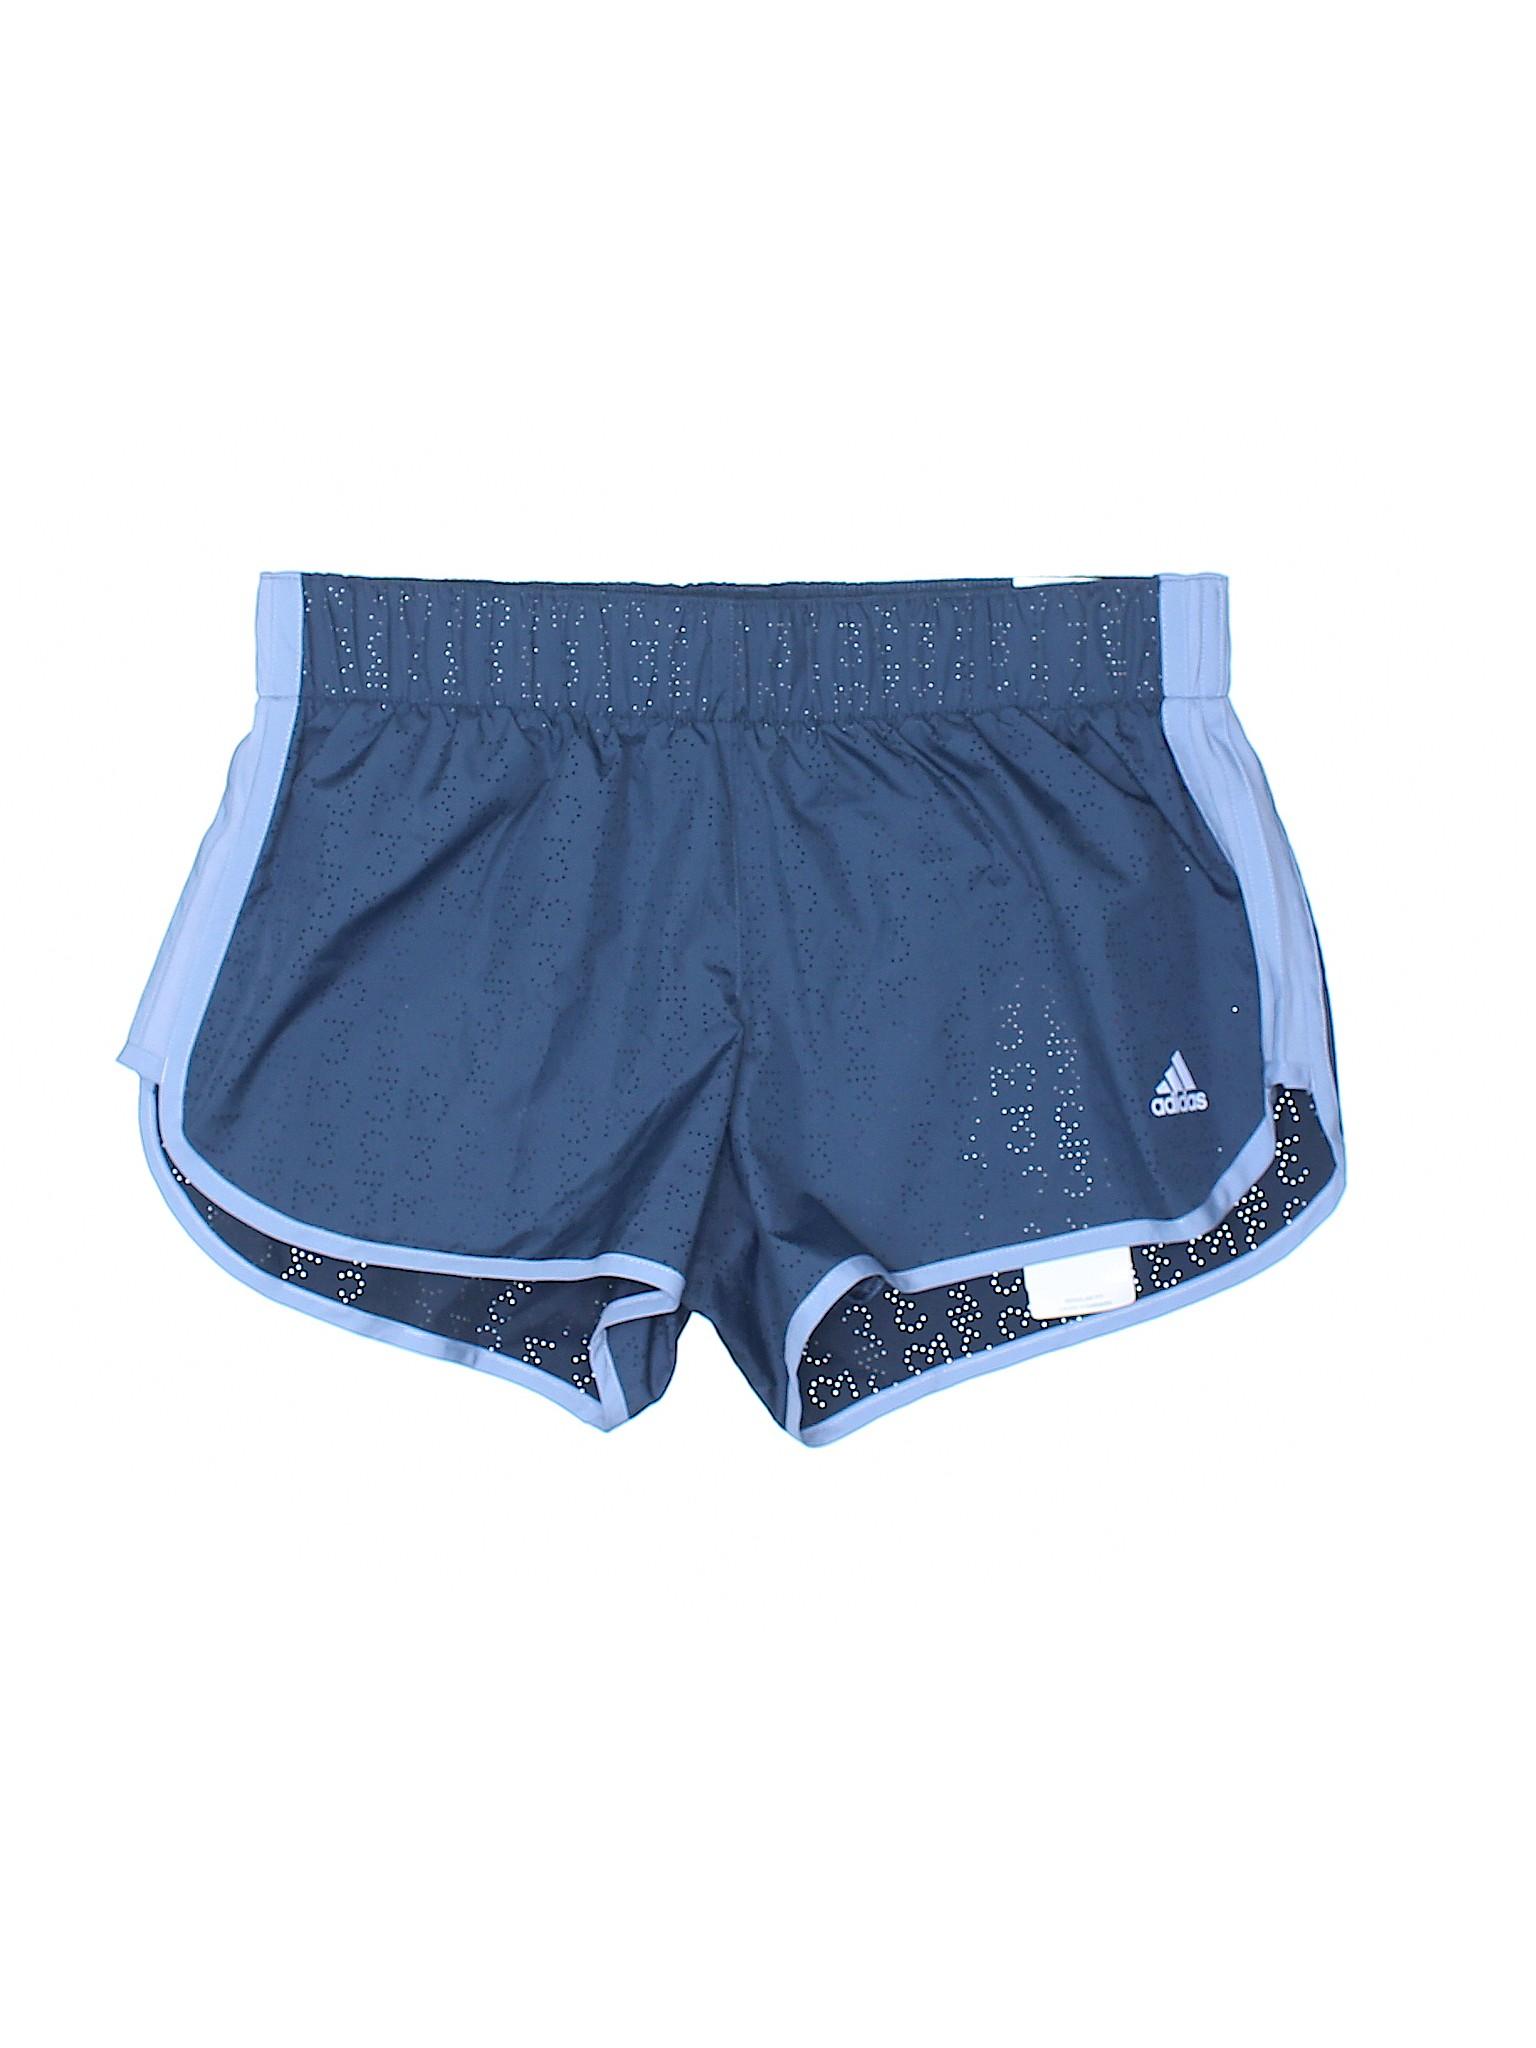 Adidas Boutique Shorts Winter Athletic Boutique Shorts Athletic Winter Adidas 4EIHqqw8